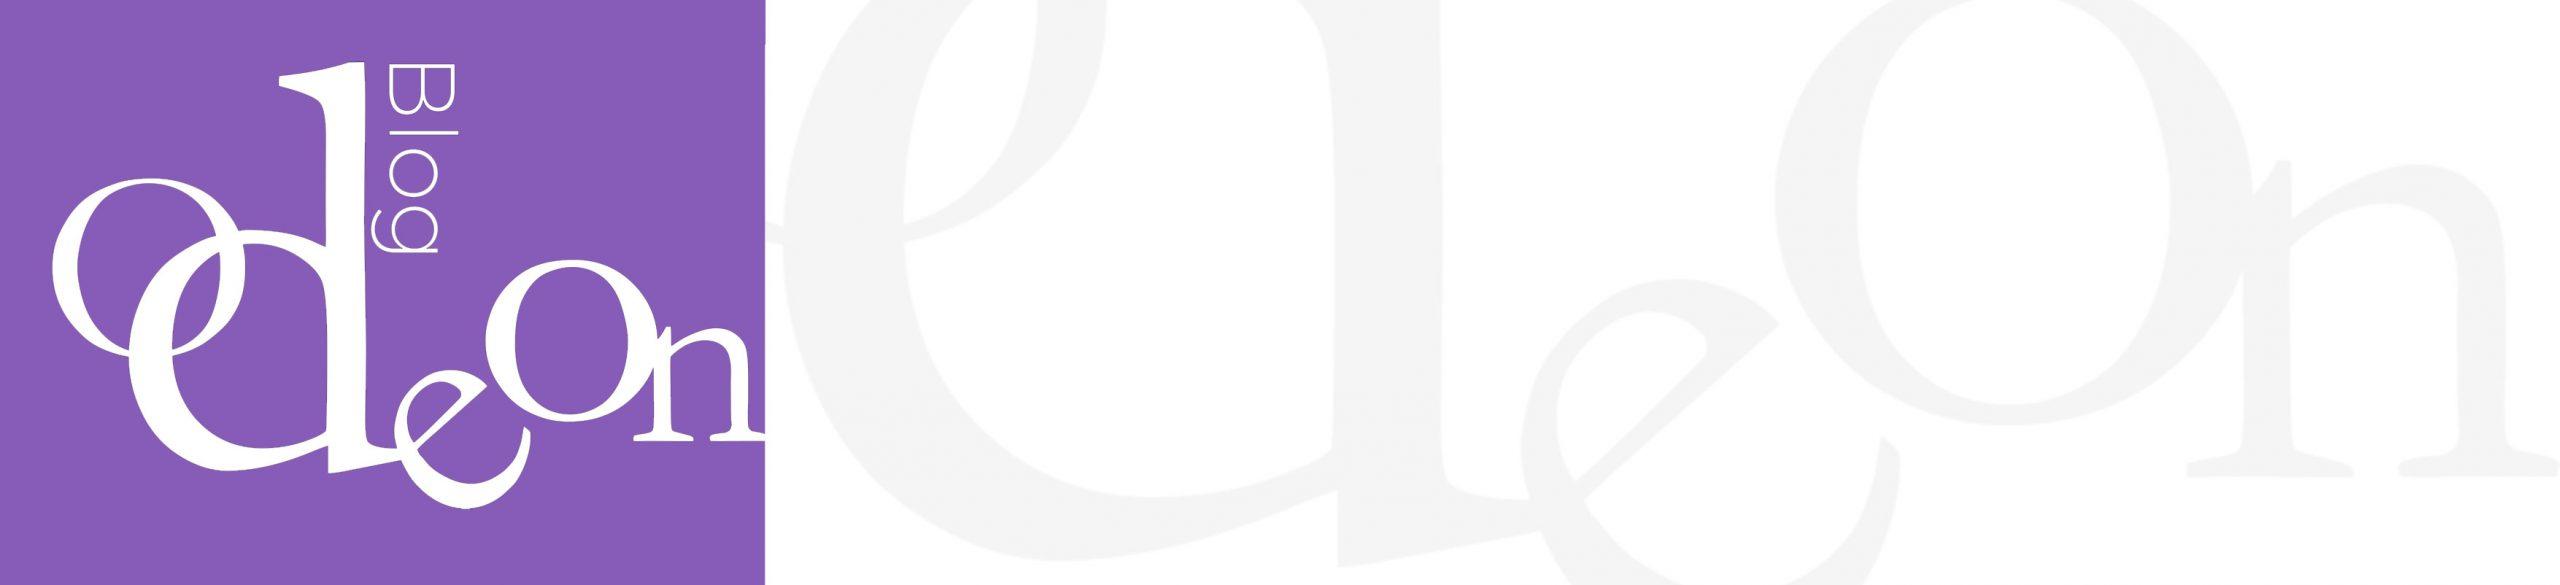 Odeon Blog